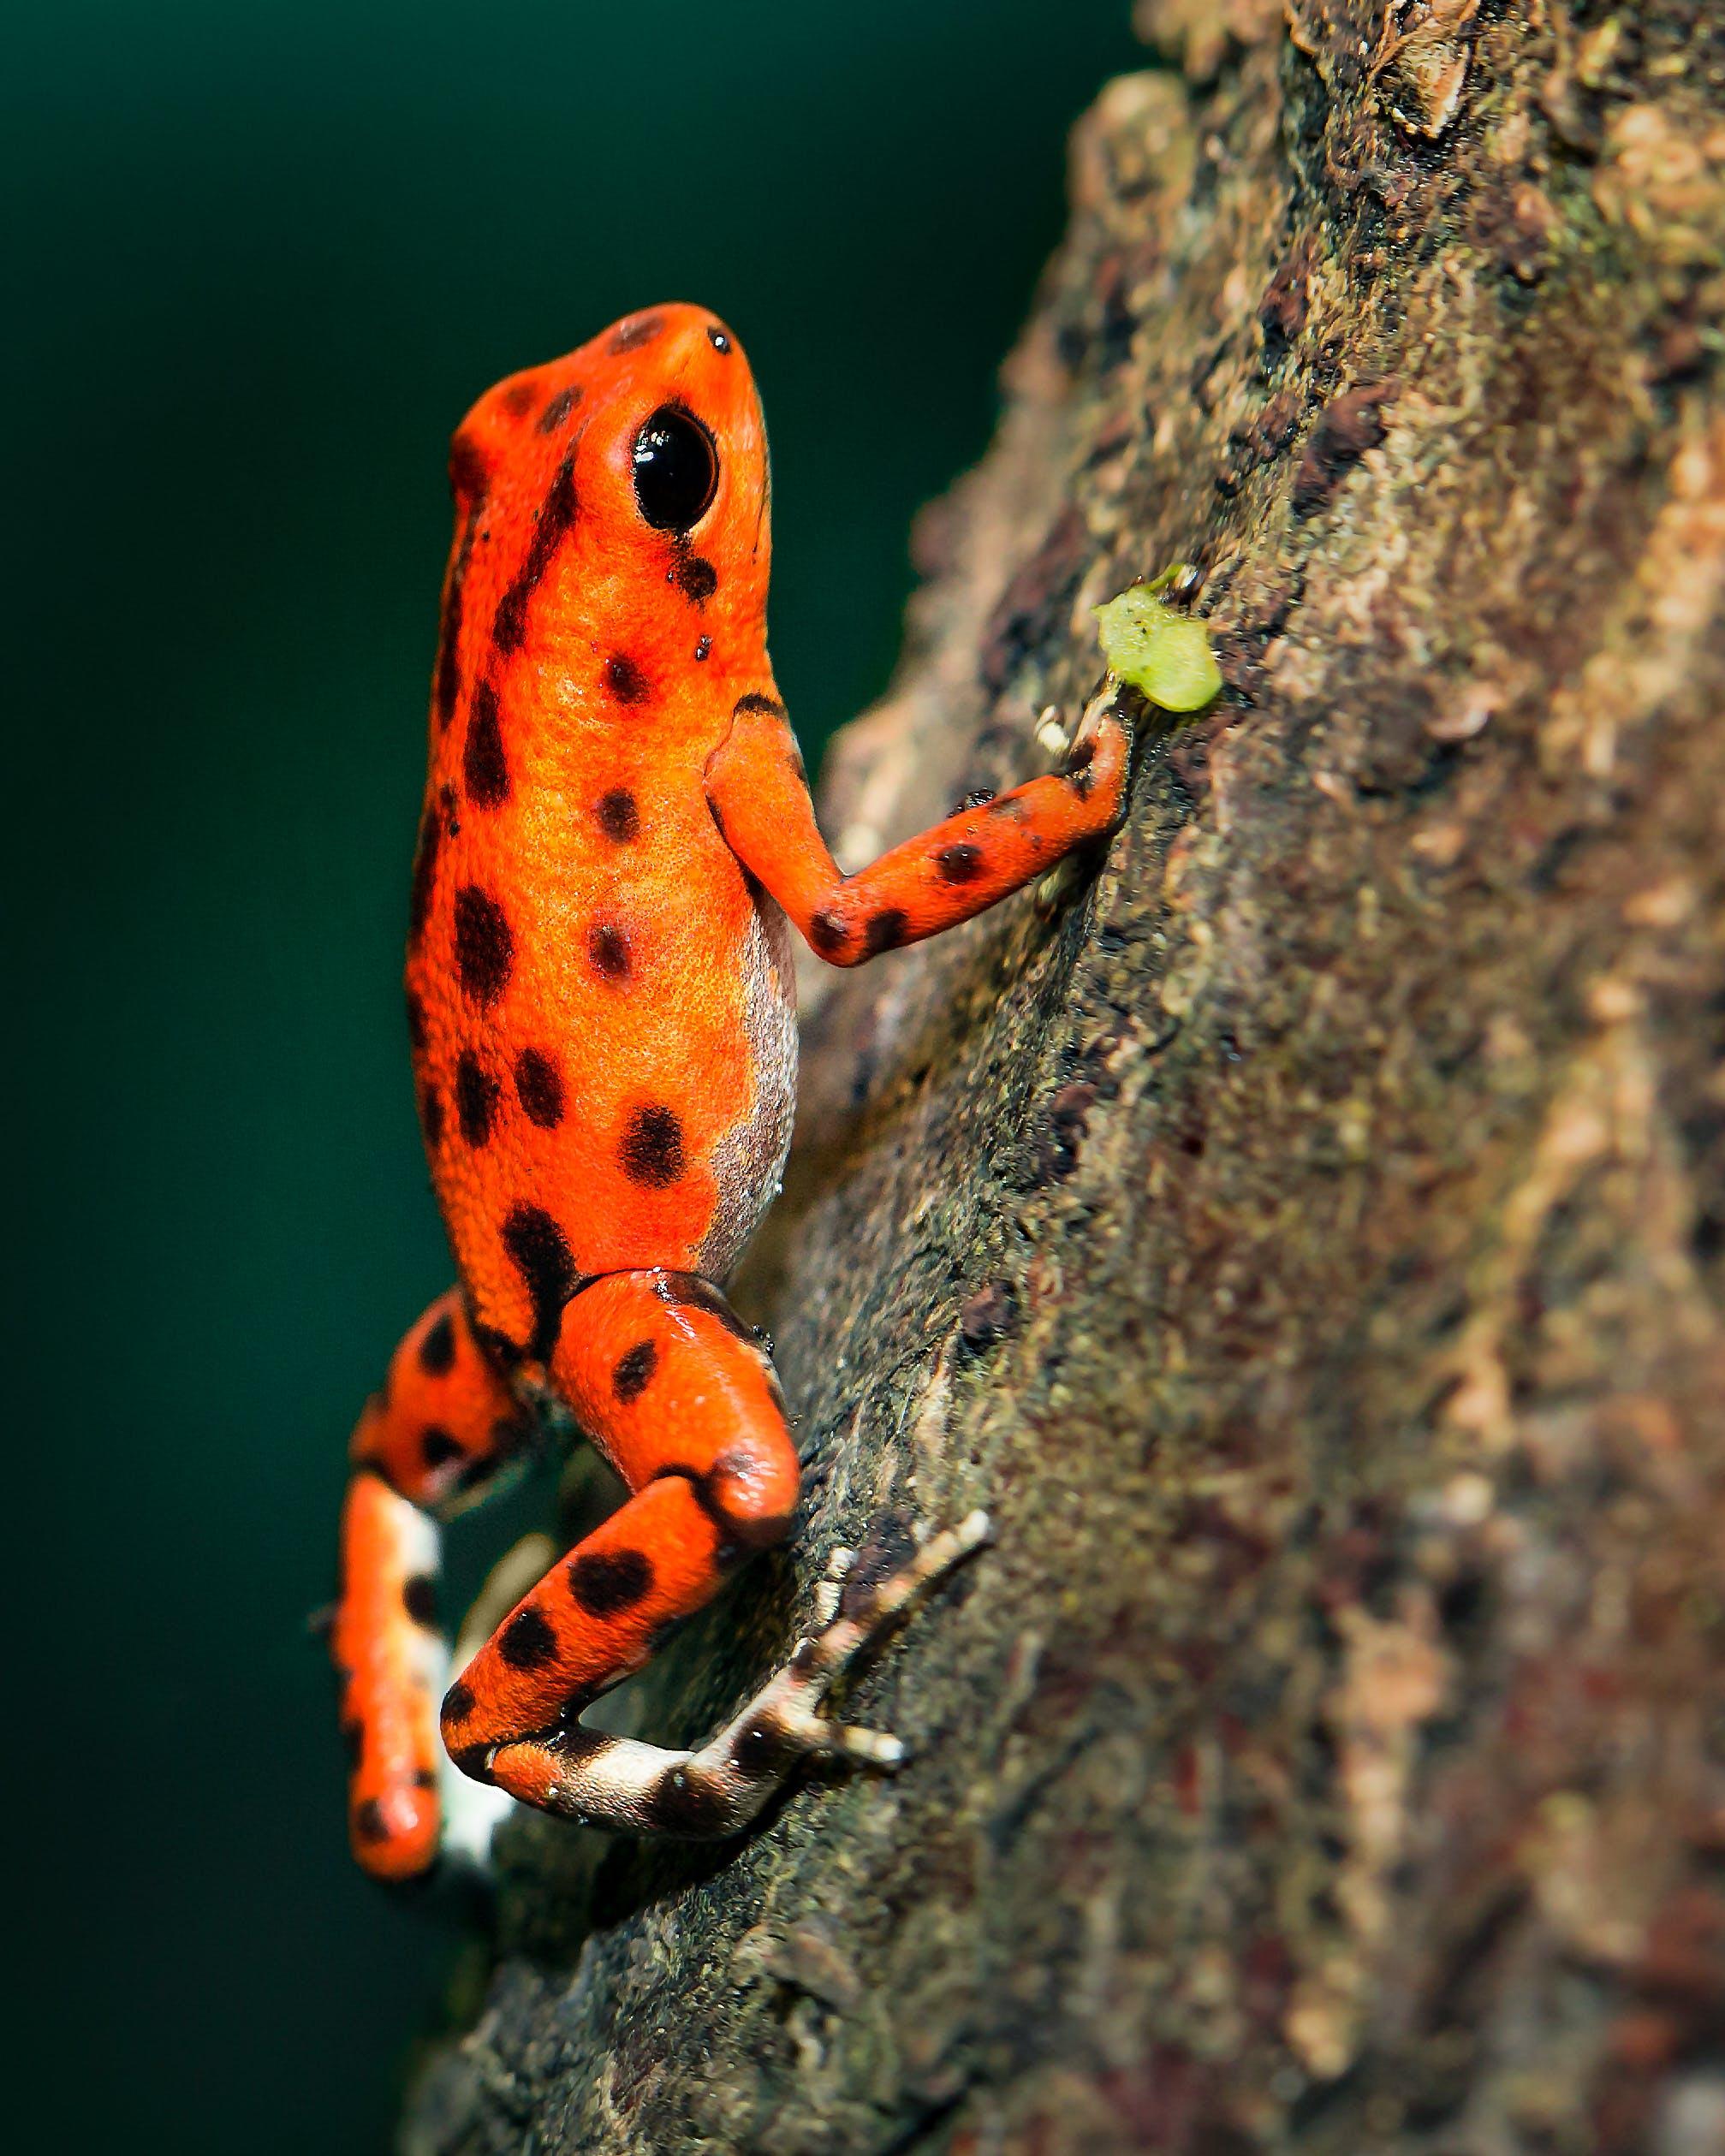 Orange and Black Poison Darth Frog